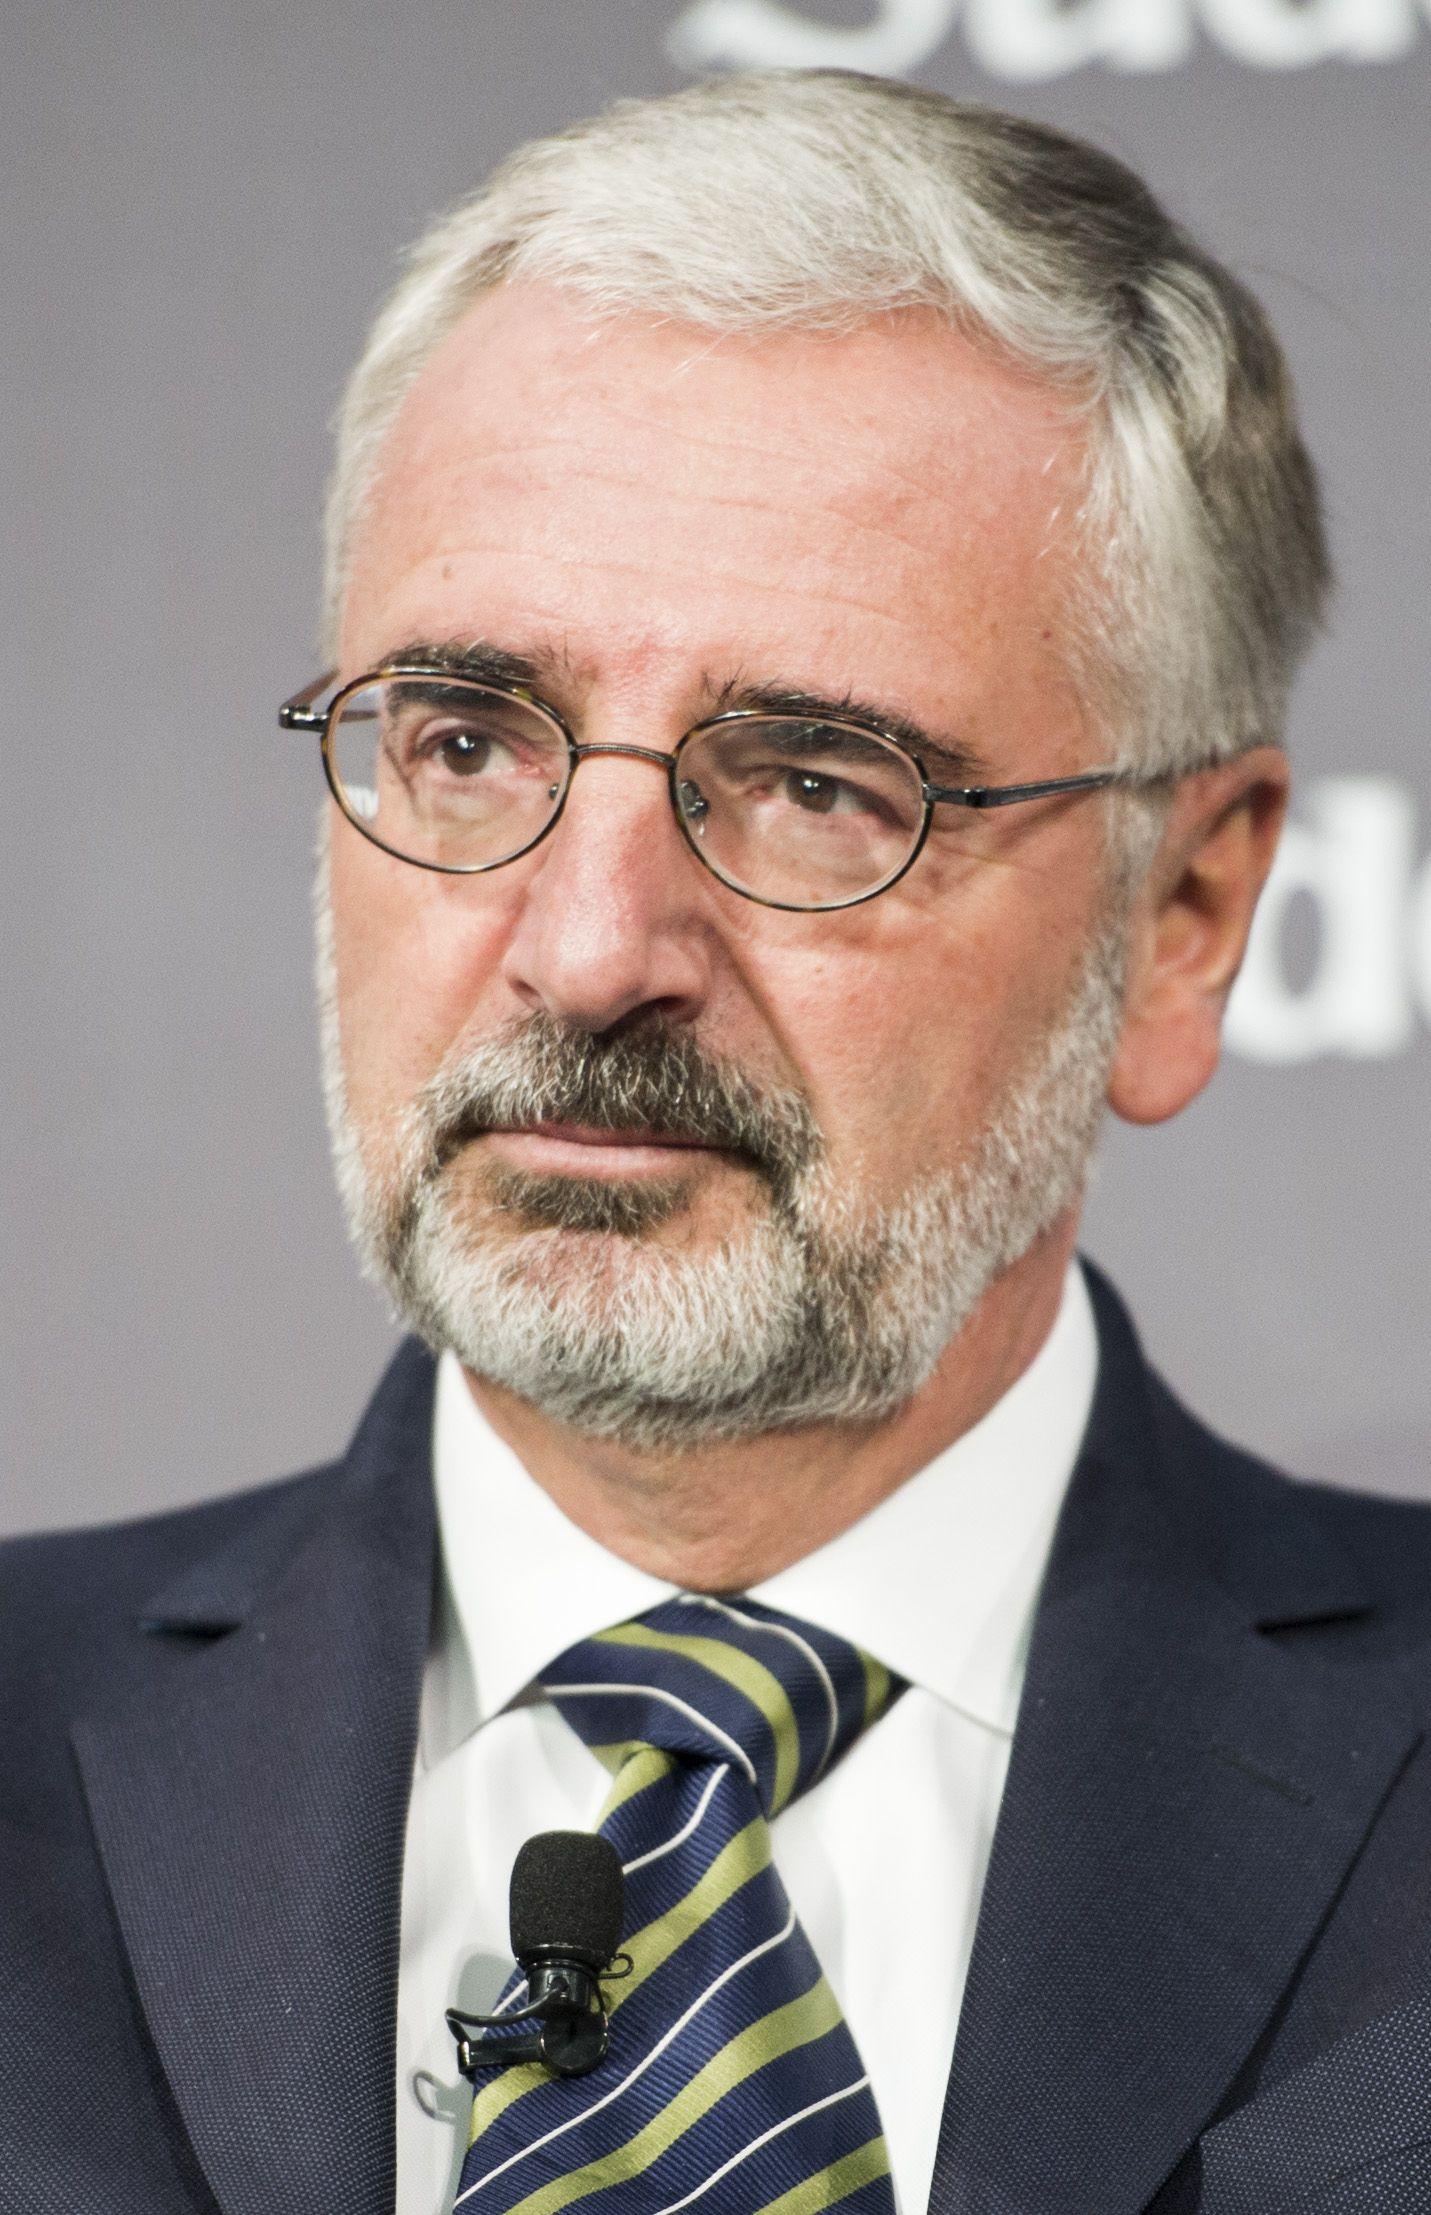 Paul Achleitner; Deutsche Bank